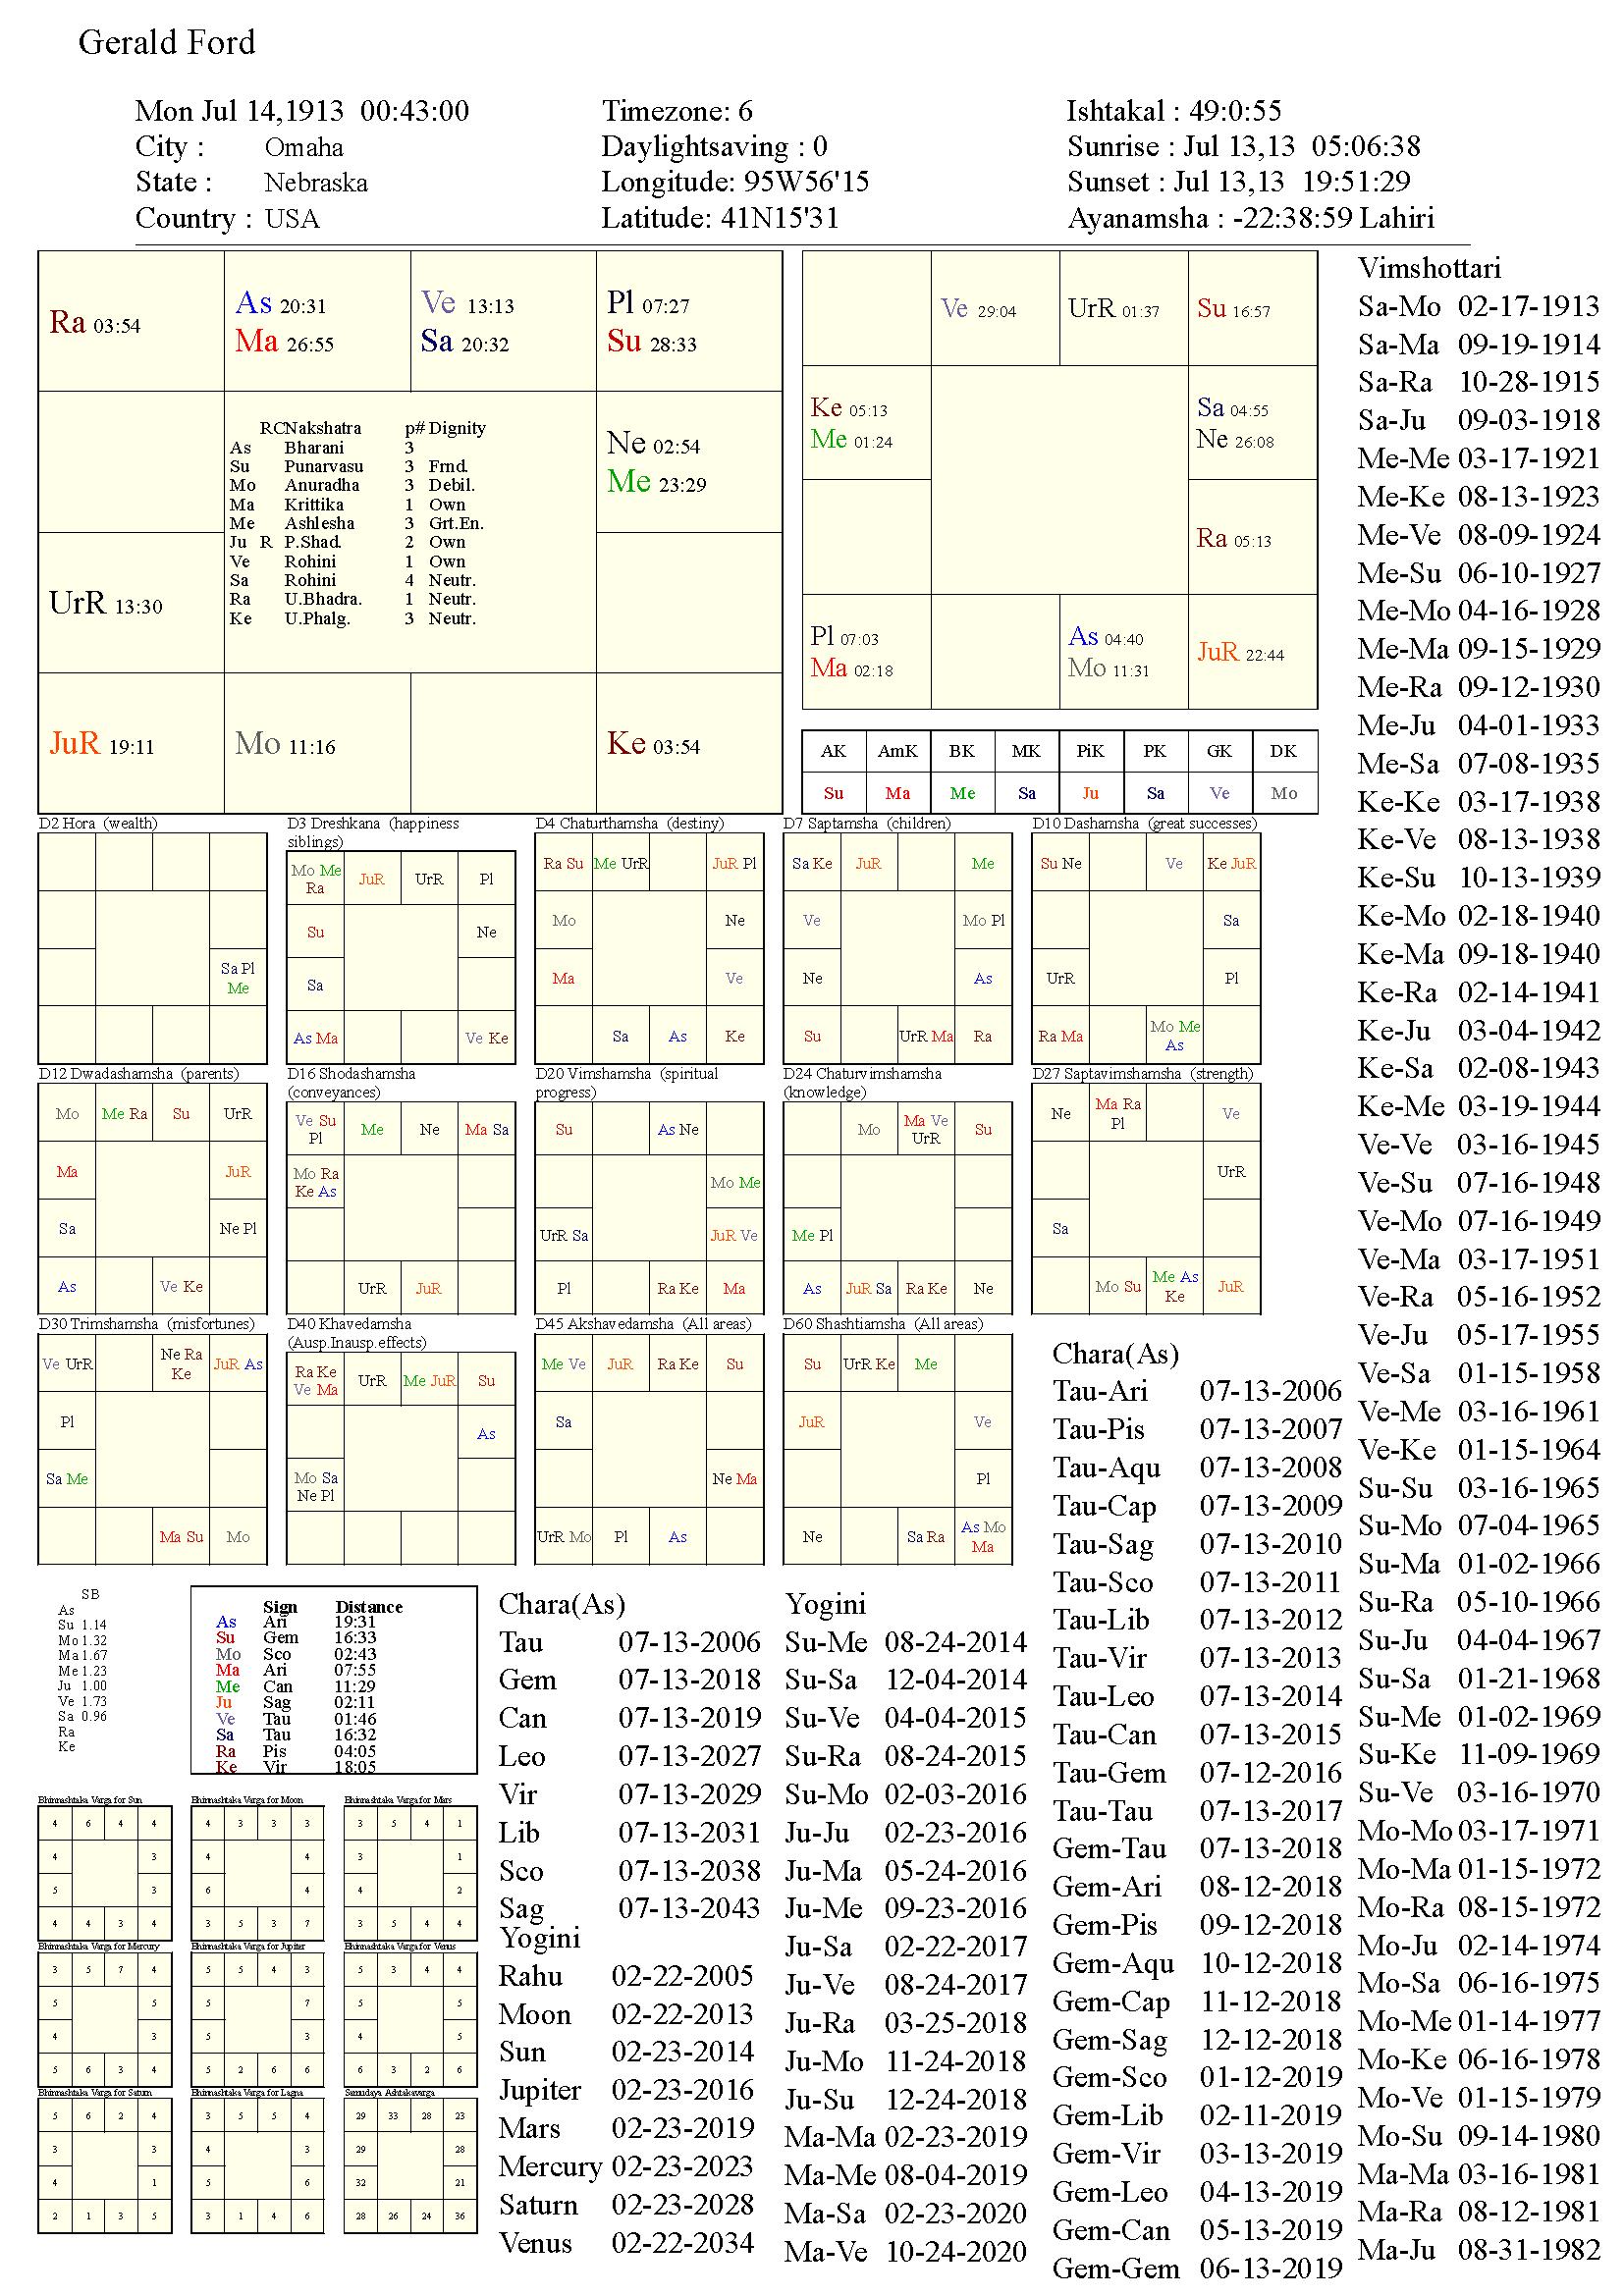 geraldford_chart